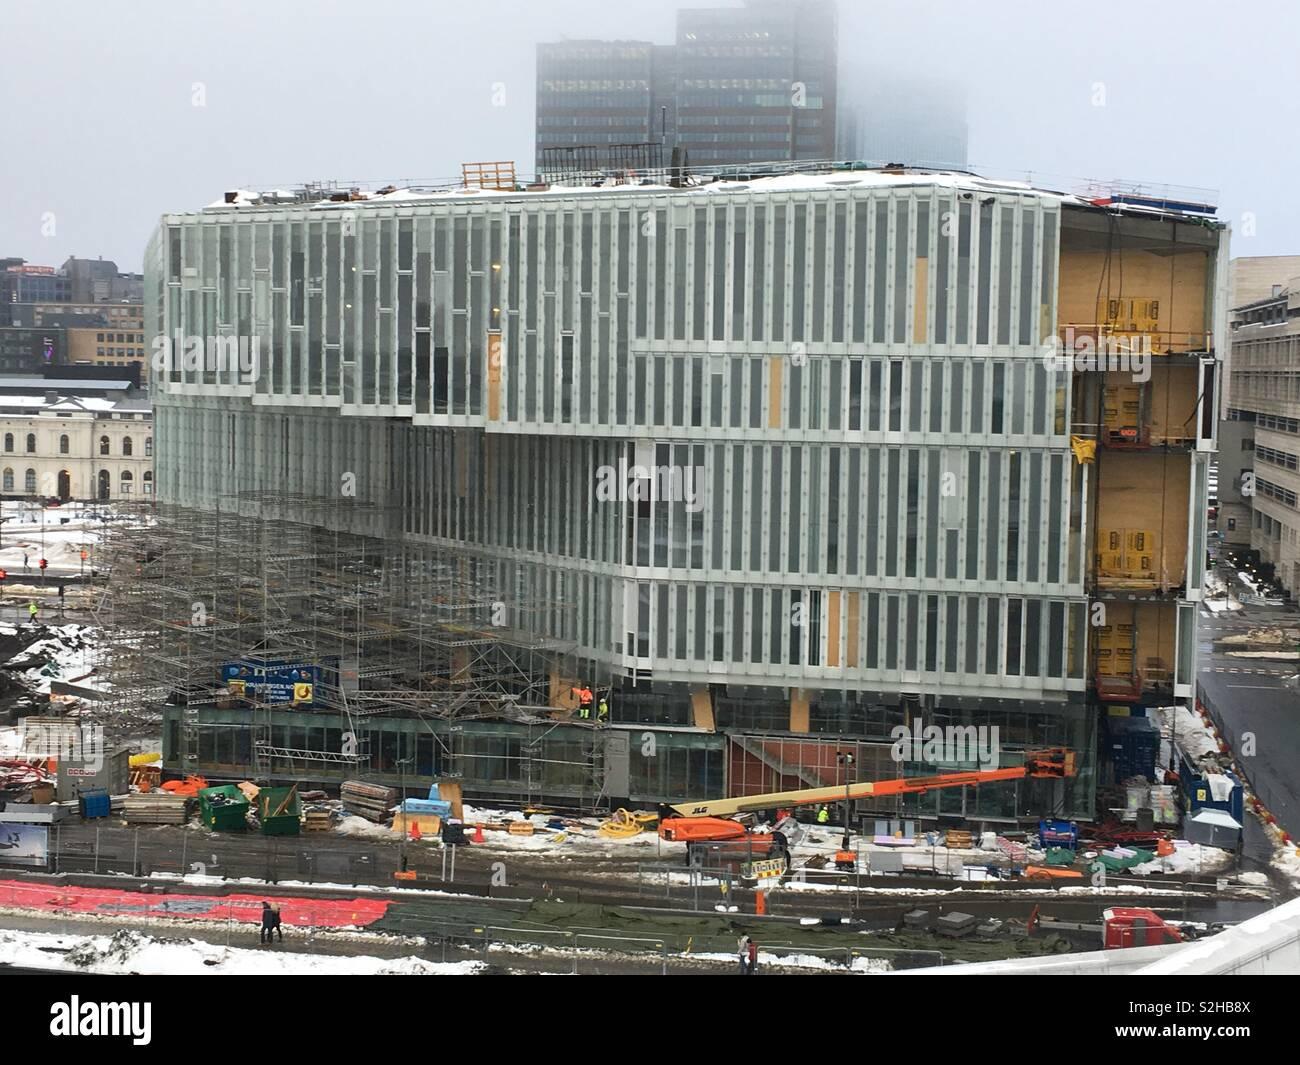 New Deichman Library under construction in Bjorvika area of Oslo, Norway (February 2019) - Stock Image